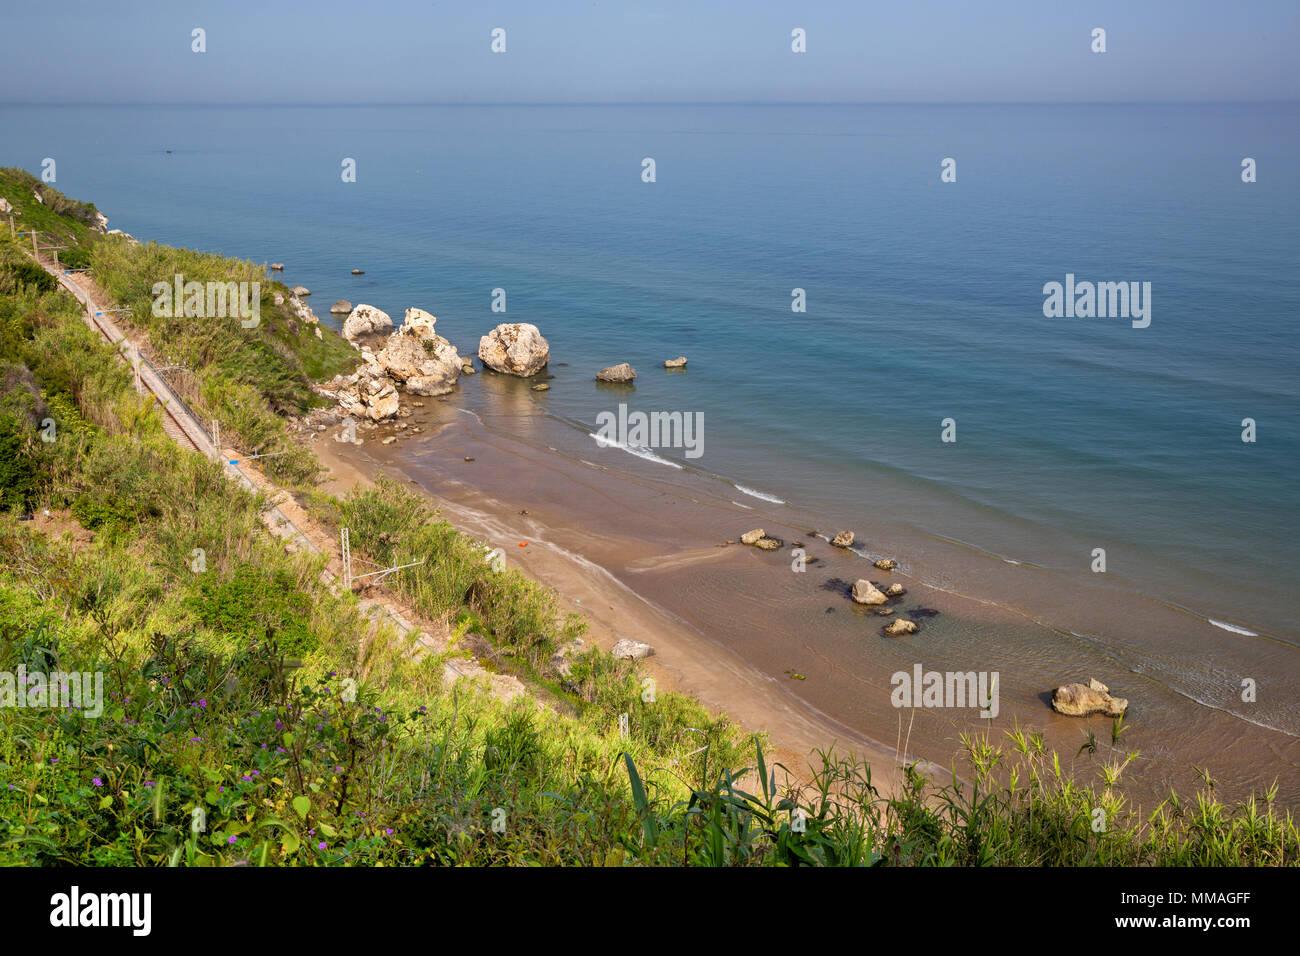 Rodi Garganico (Puglia, Italy) - View of the beach and the sea - Stock Image